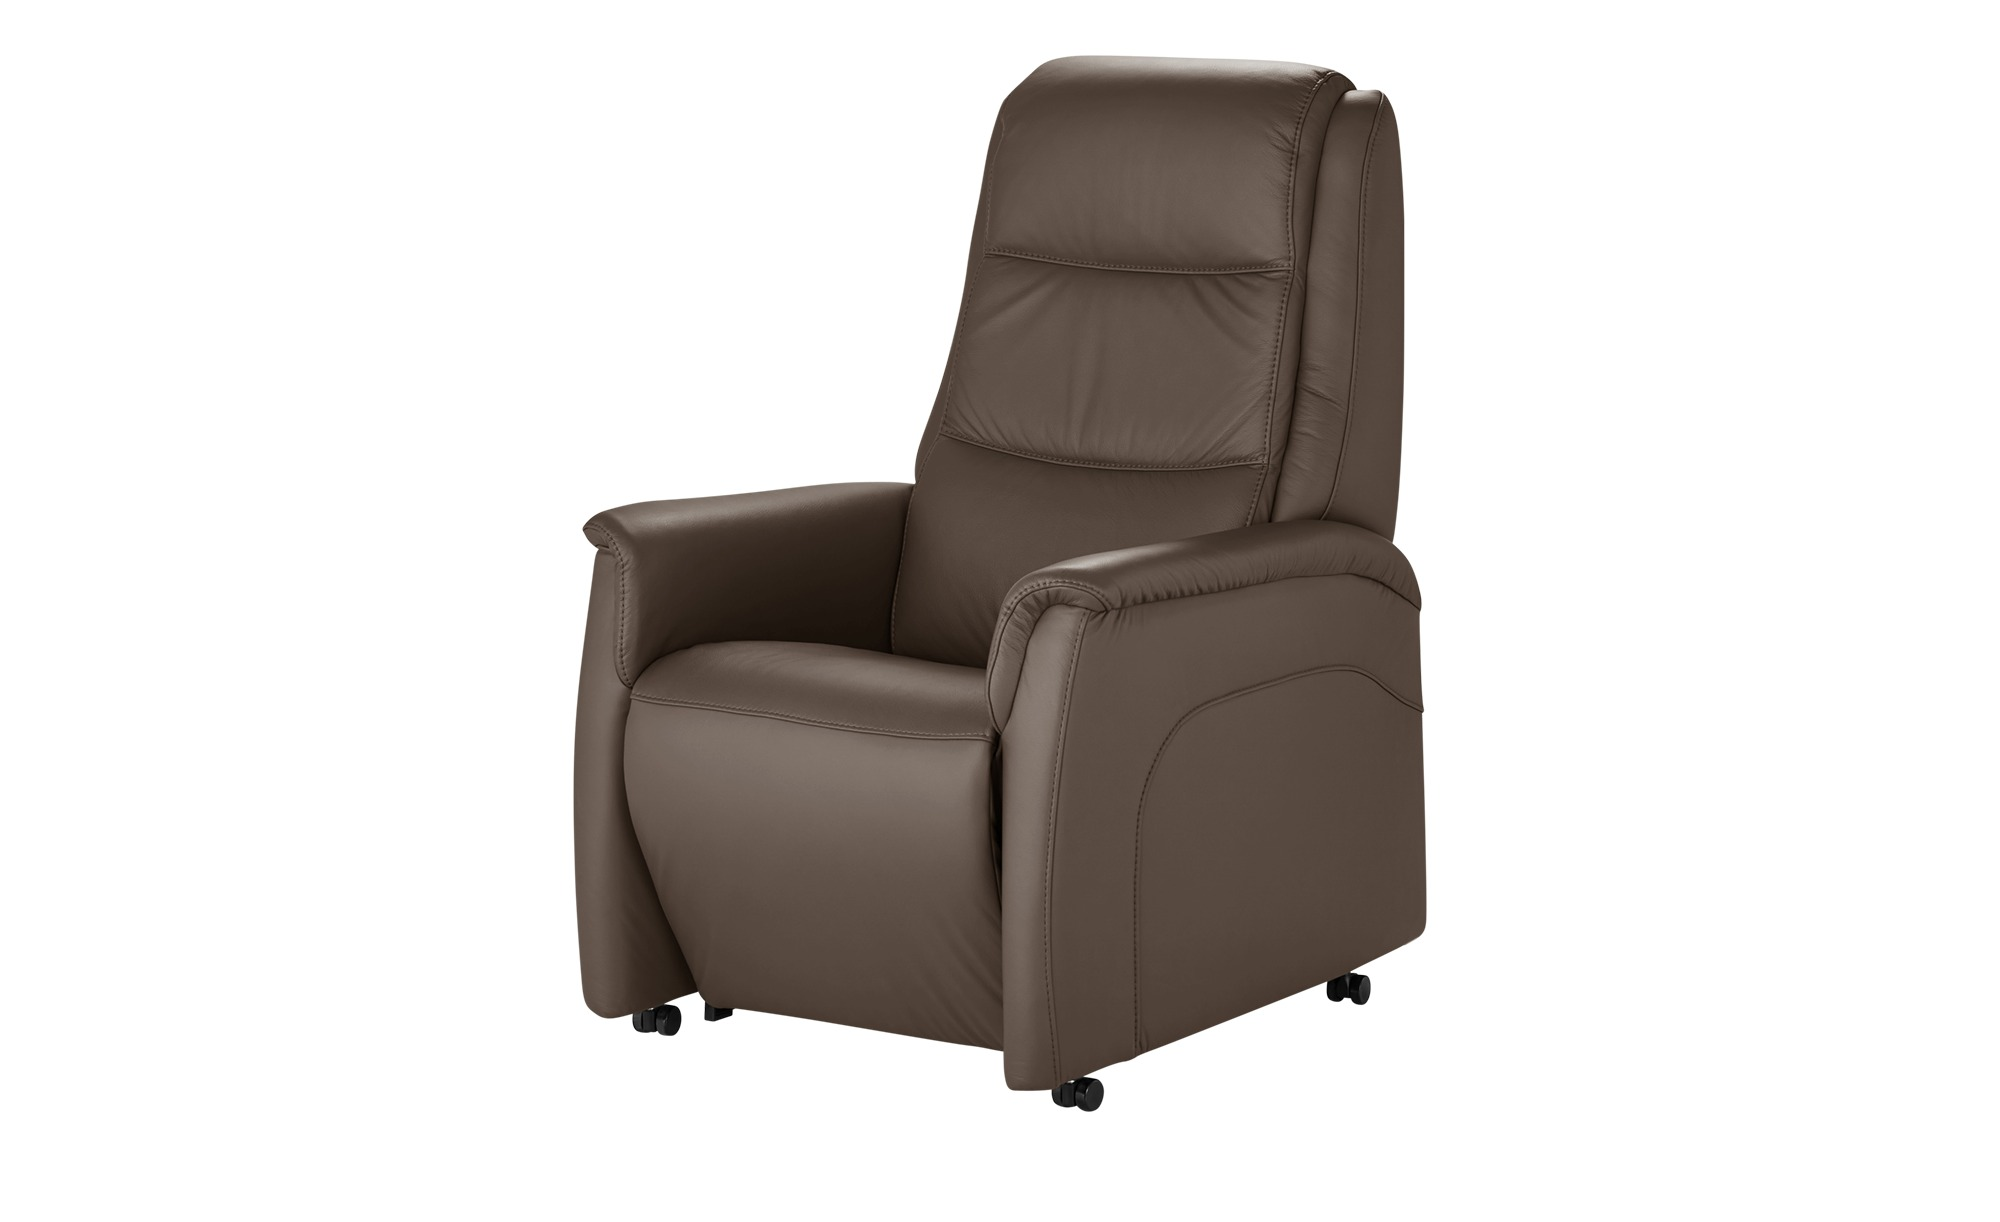 Hukla Fernsehsessel  Dean ¦ braun ¦ Maße (cm): B: 70 H: 109 T: 88 Polstermöbel > Sessel > Fernsehsessel - Höffner